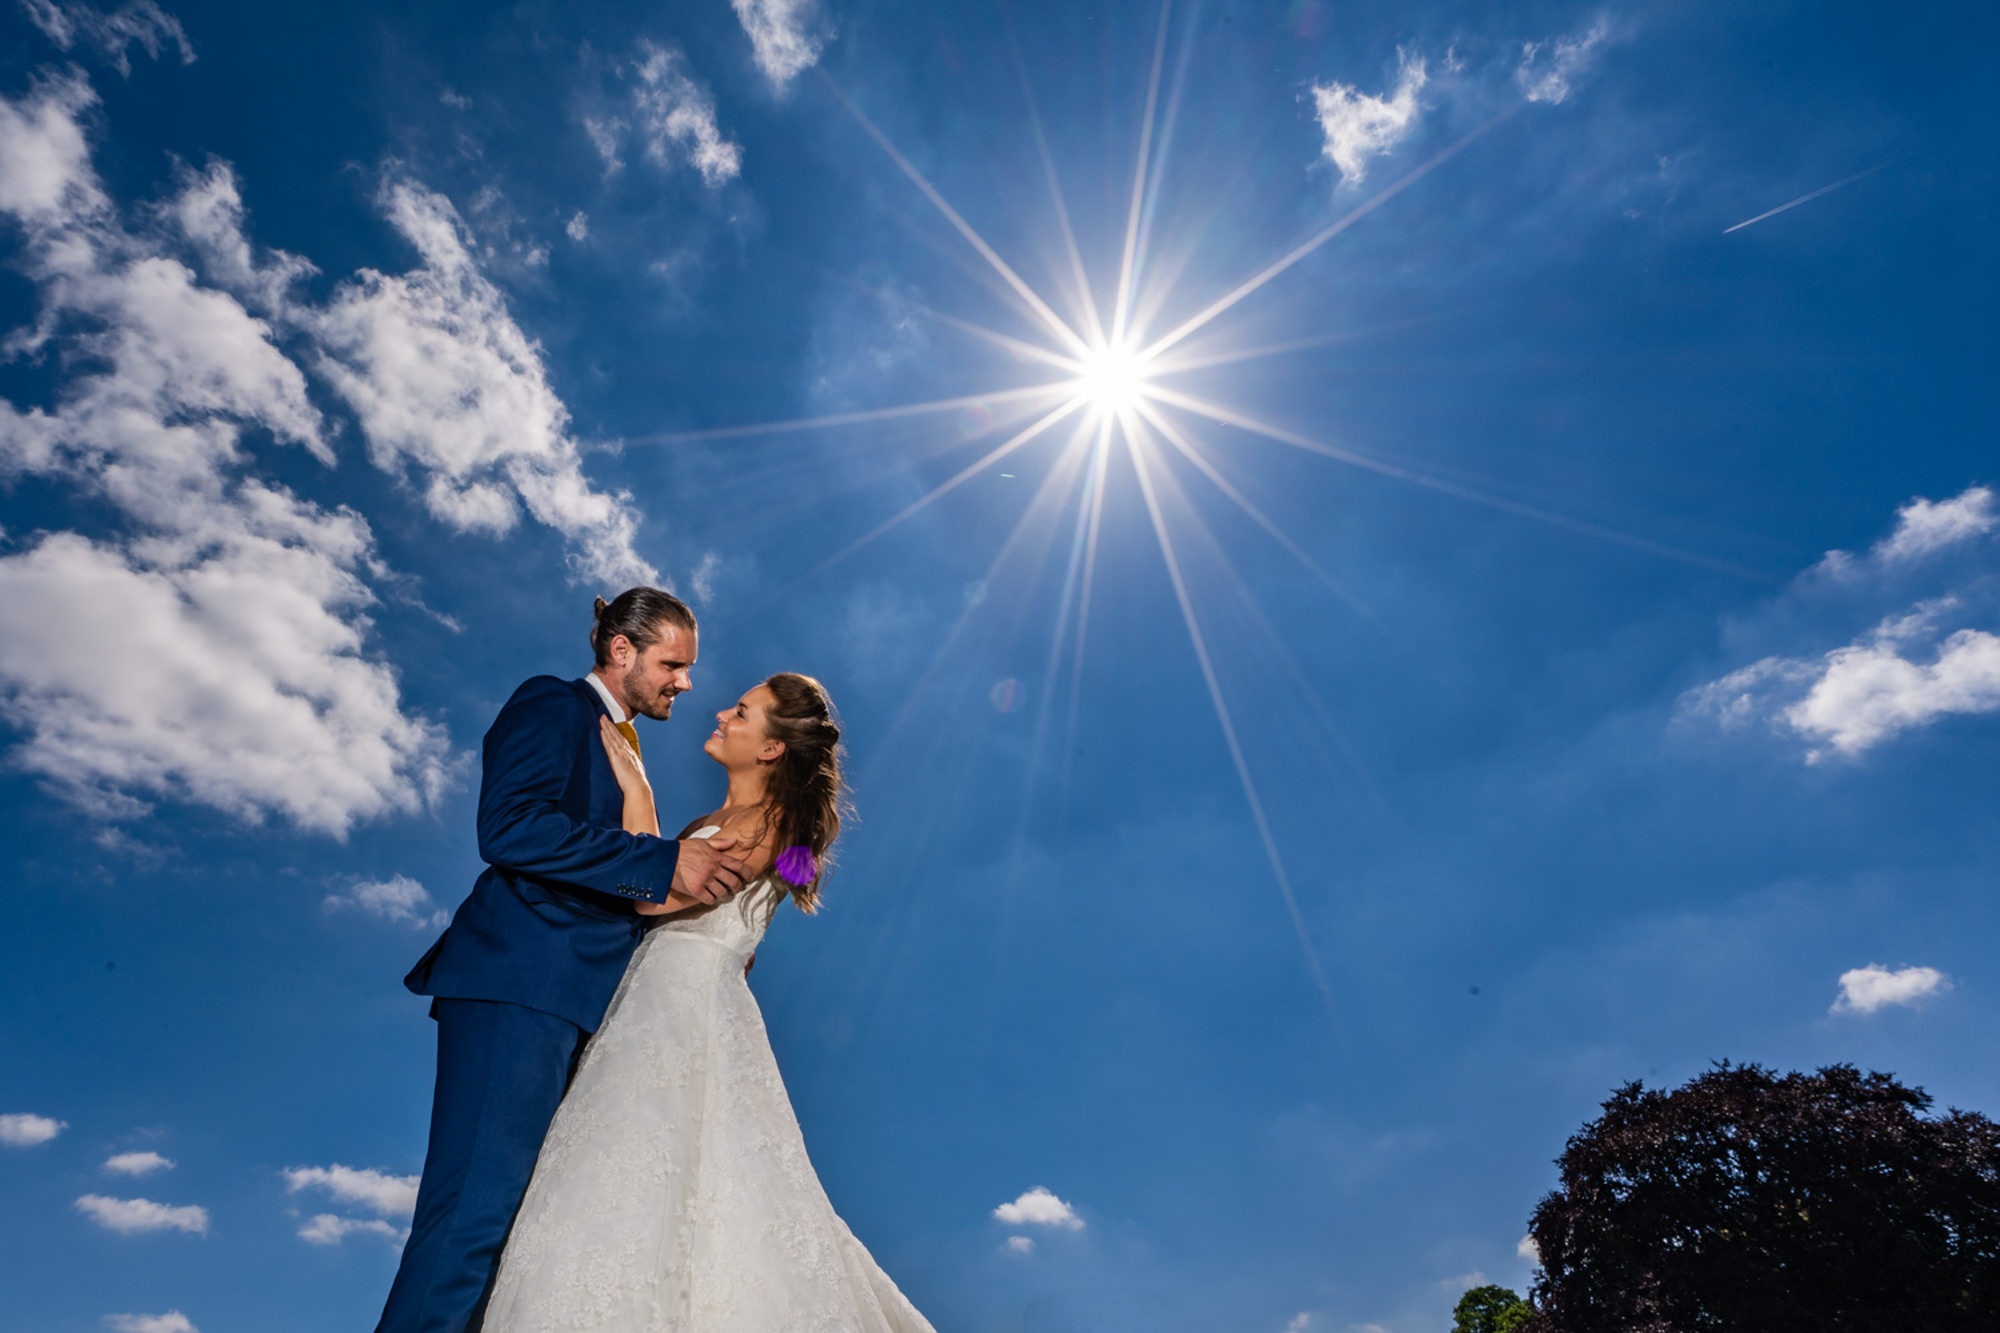 uniue-wedding-photography.jpg